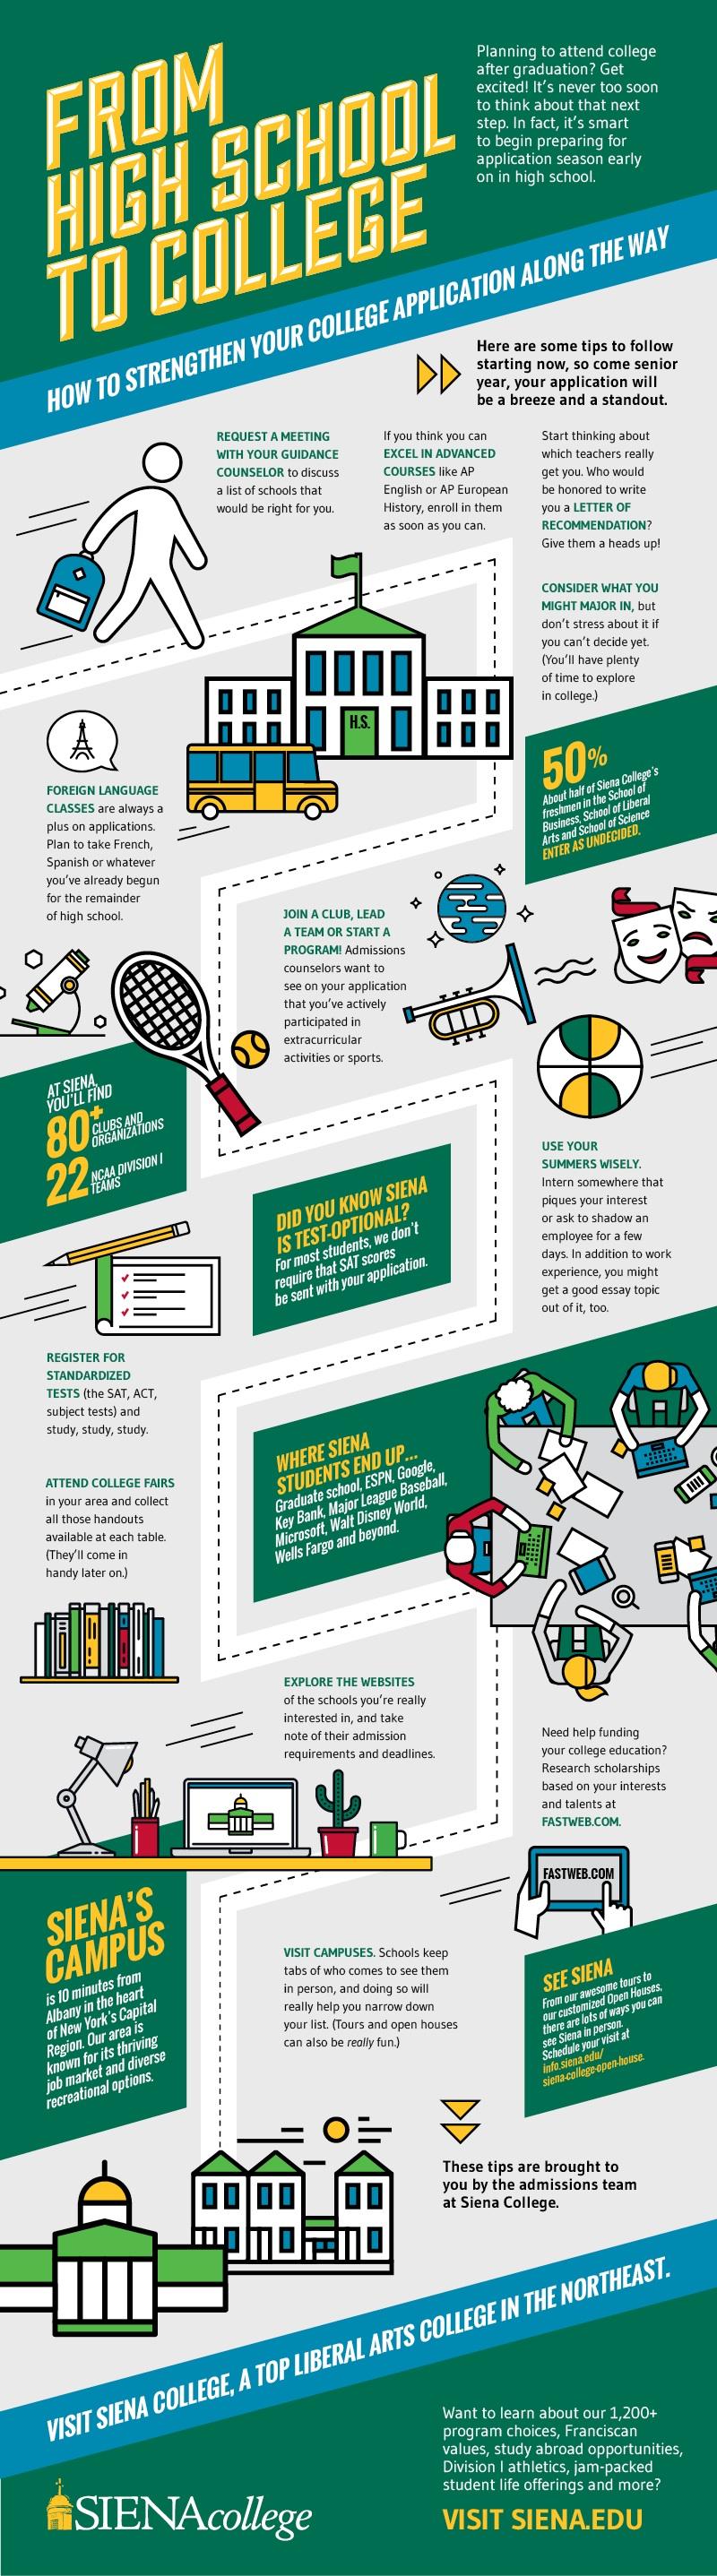 Siena_soph_infographic.jpg